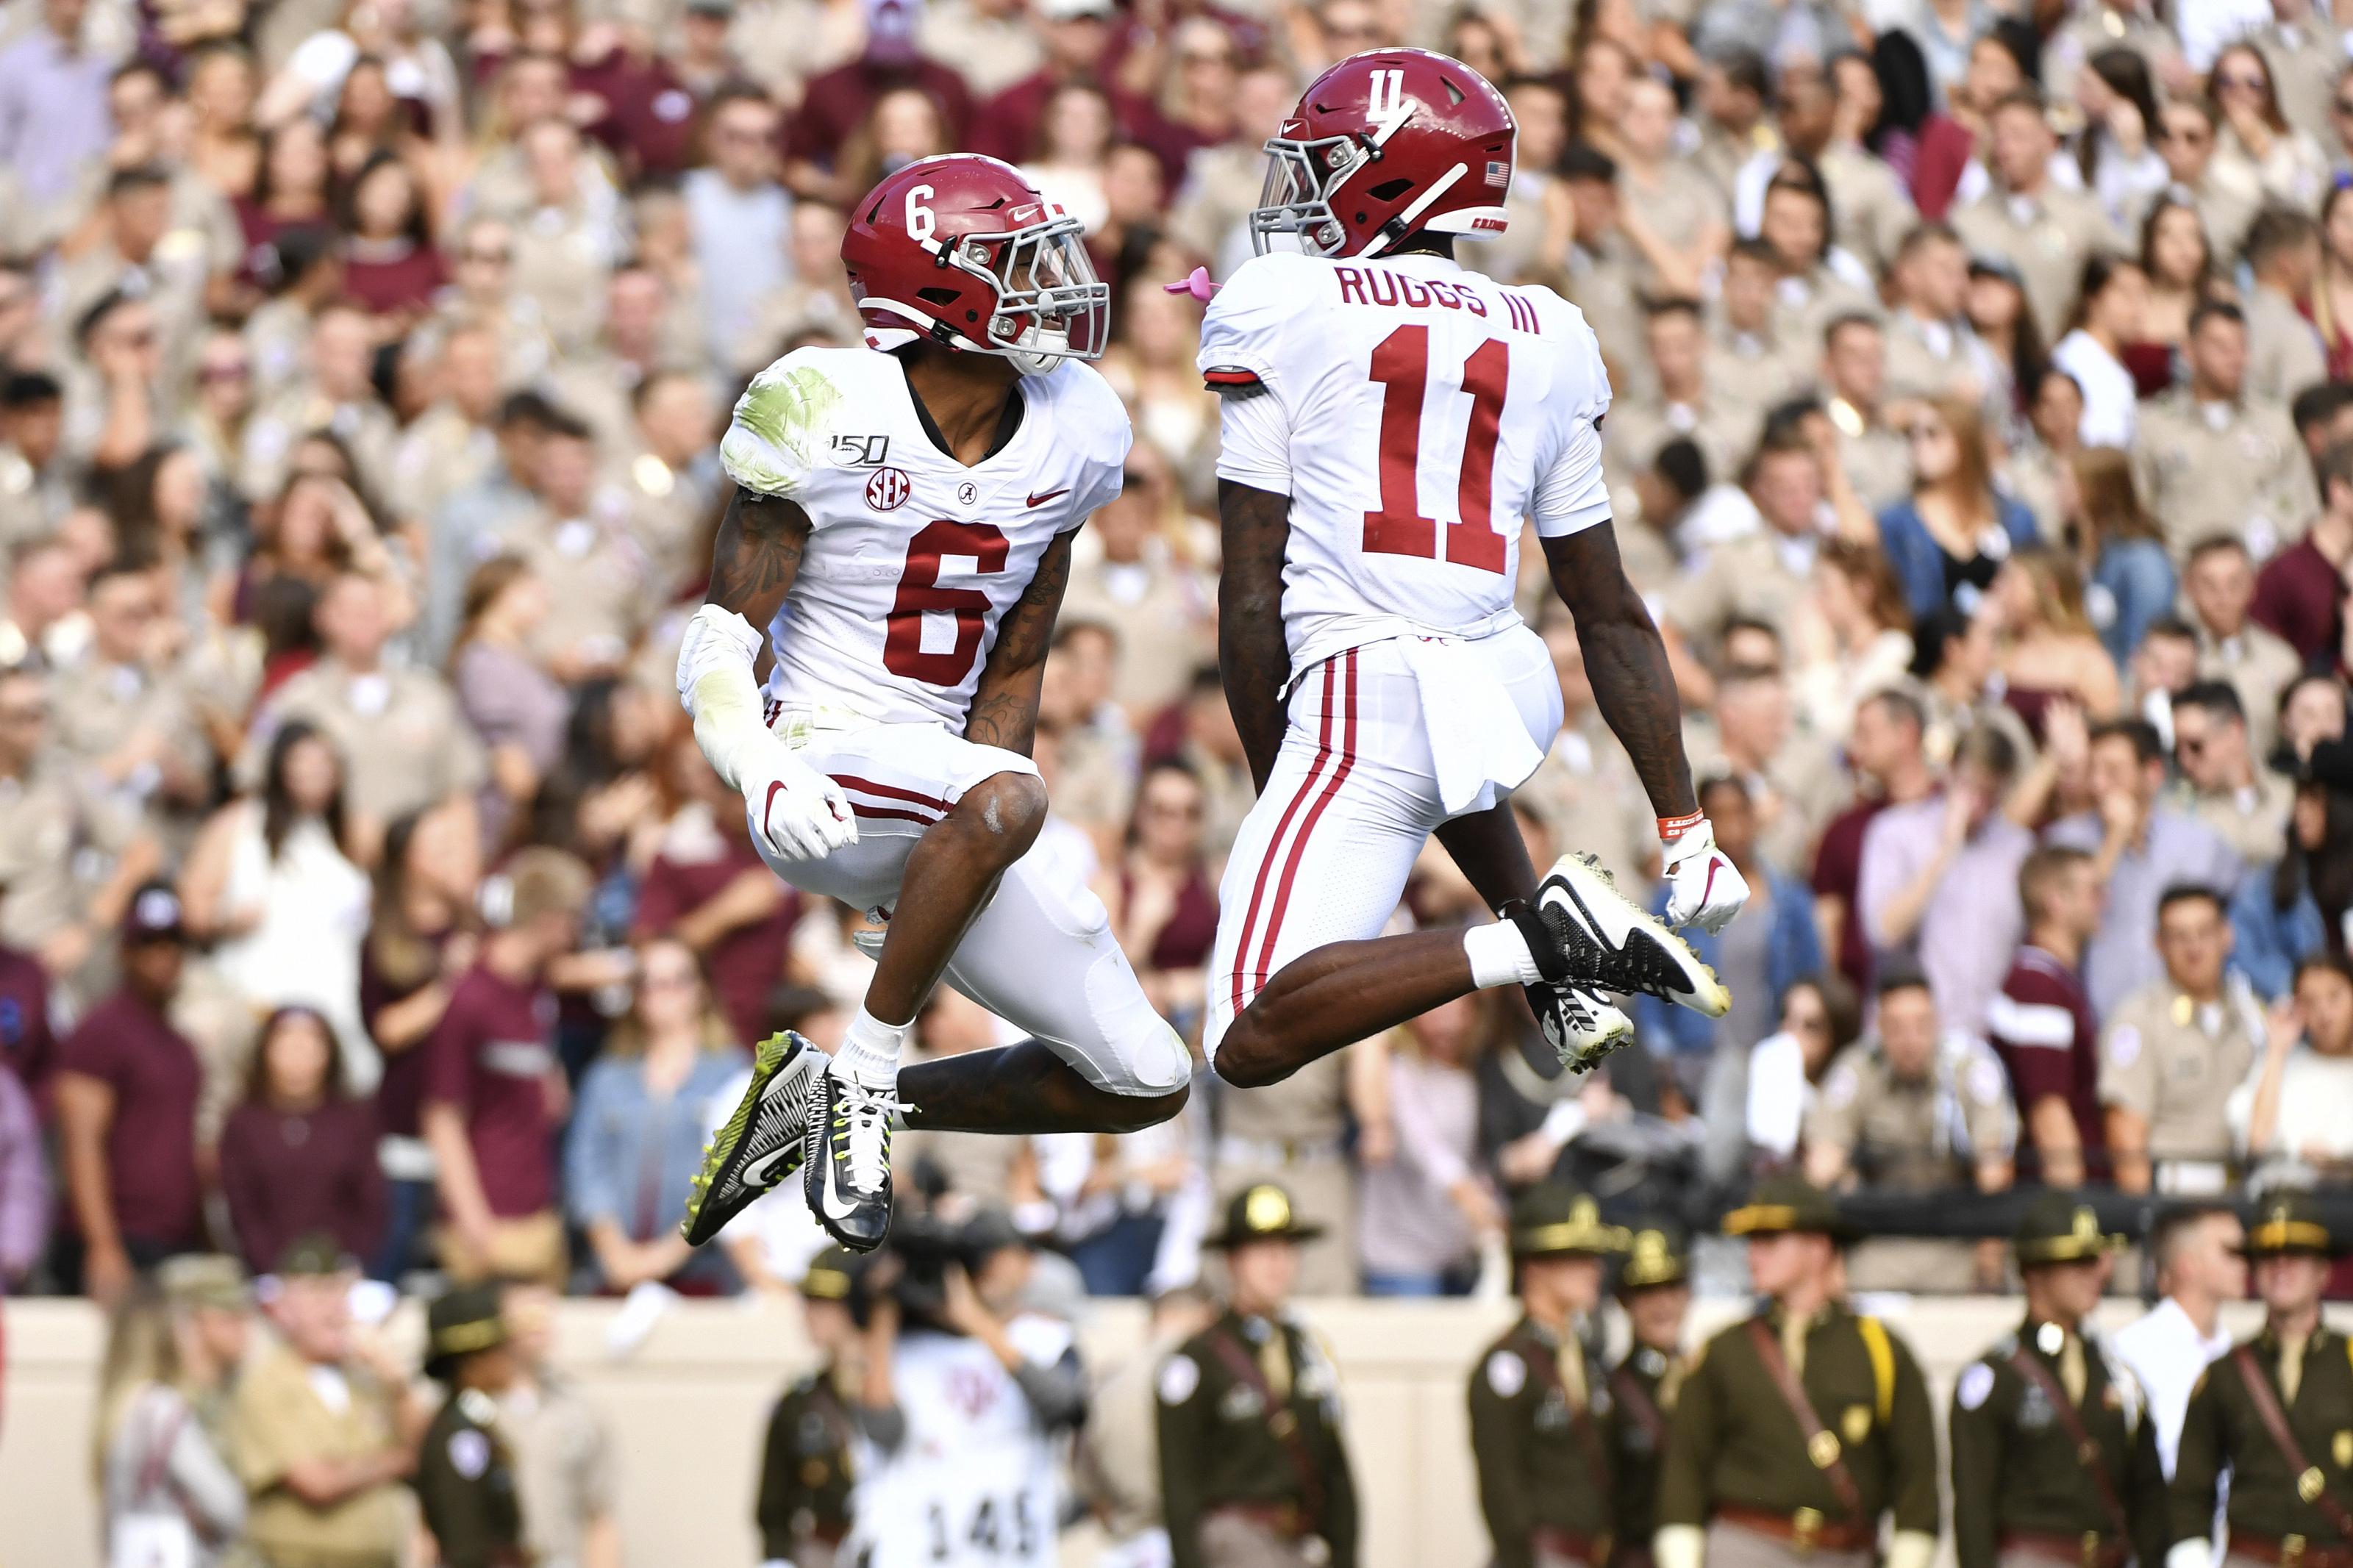 Alabama Football: Henry Ruggs III scorches NFL Combine